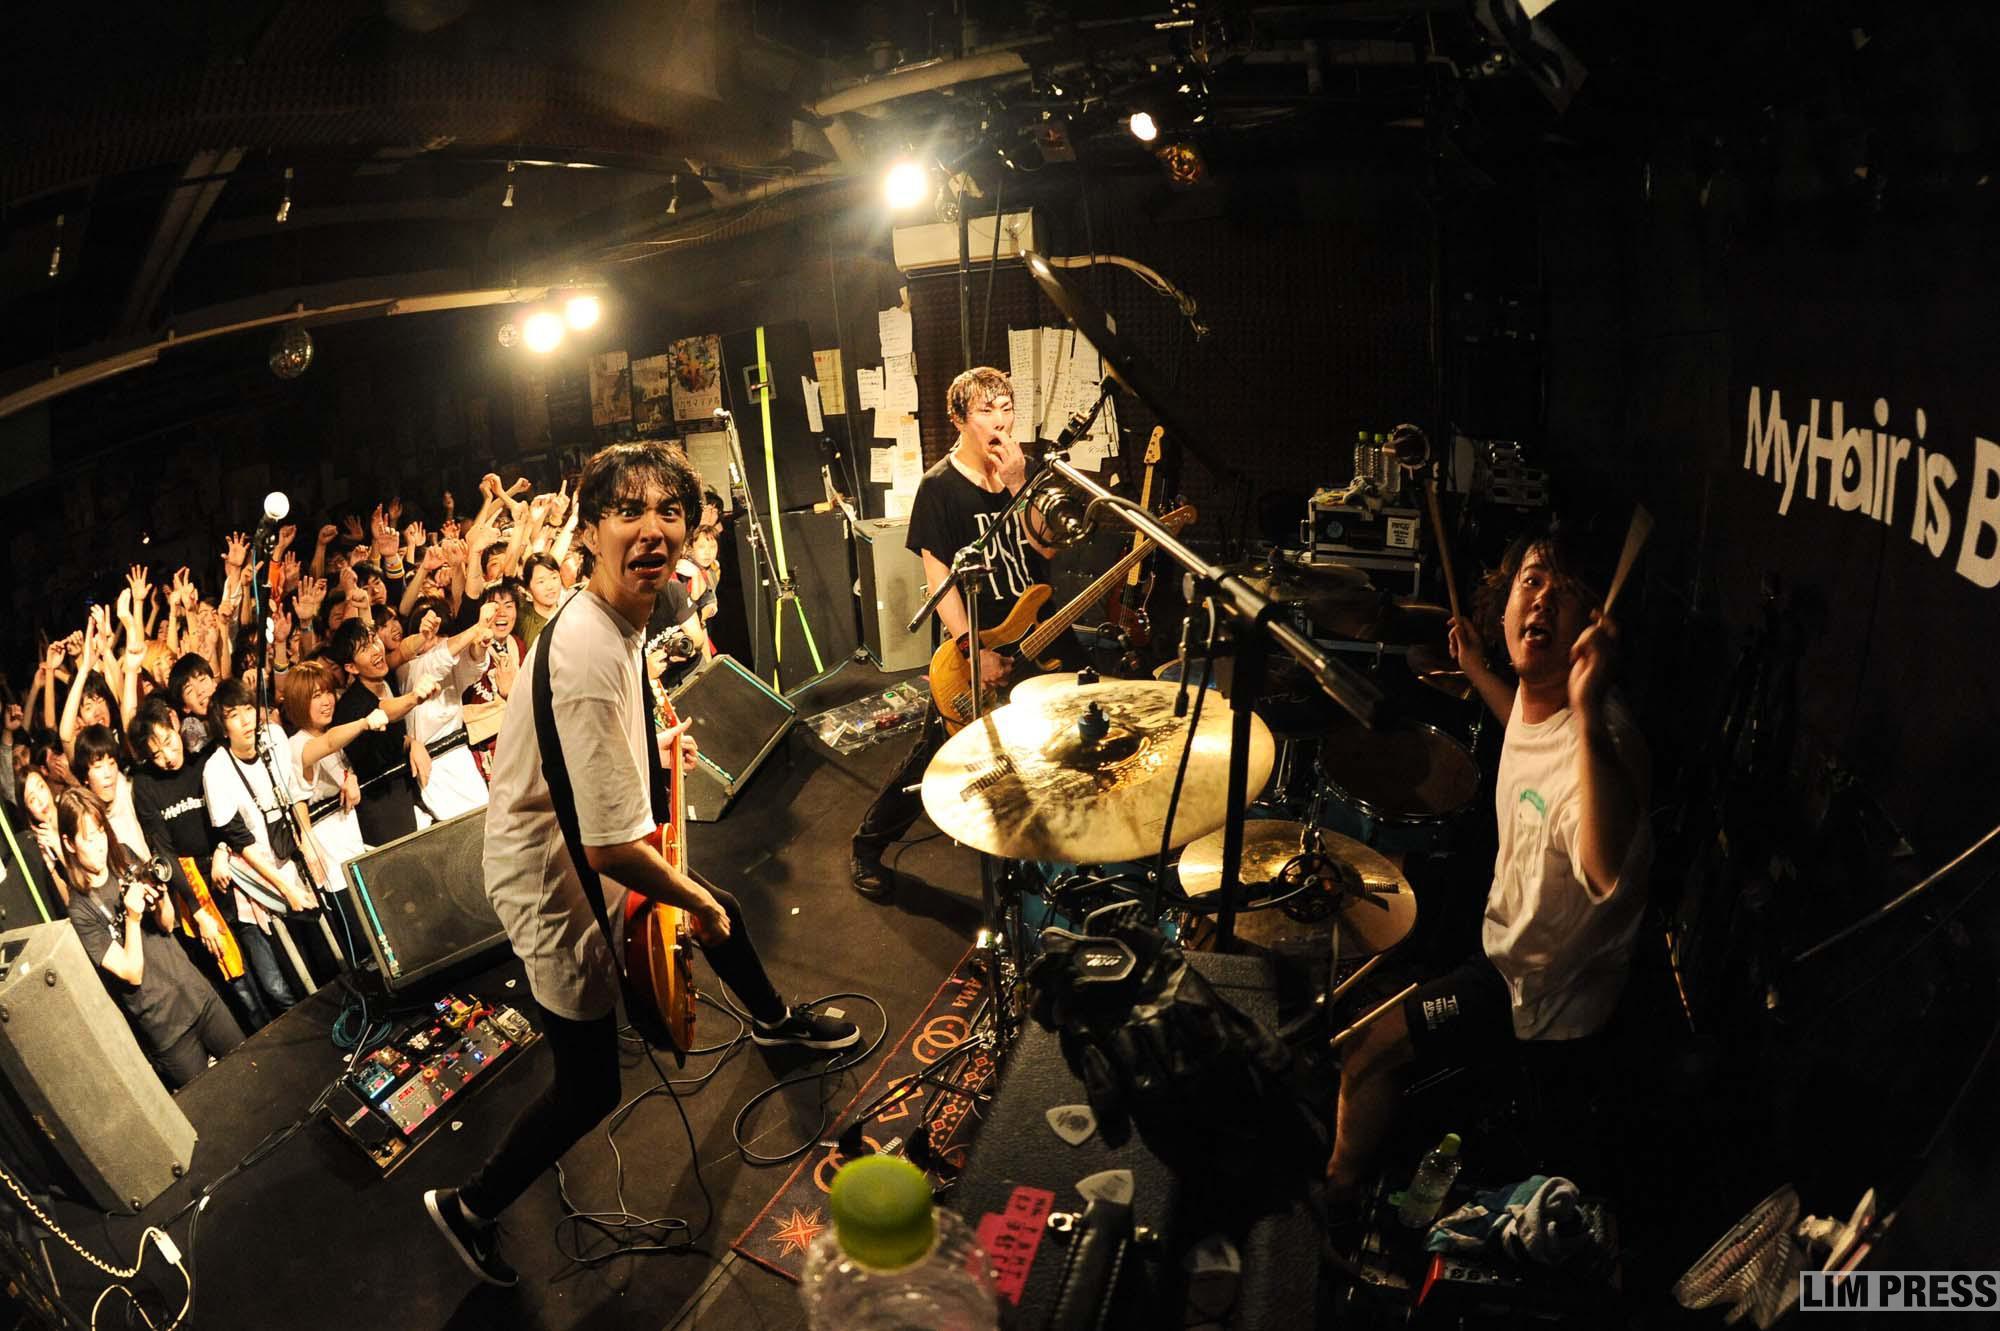 RISING SUN ROCK FESTIVAL 2019 in EZO 第1弾出演アーティスト8組を発表!